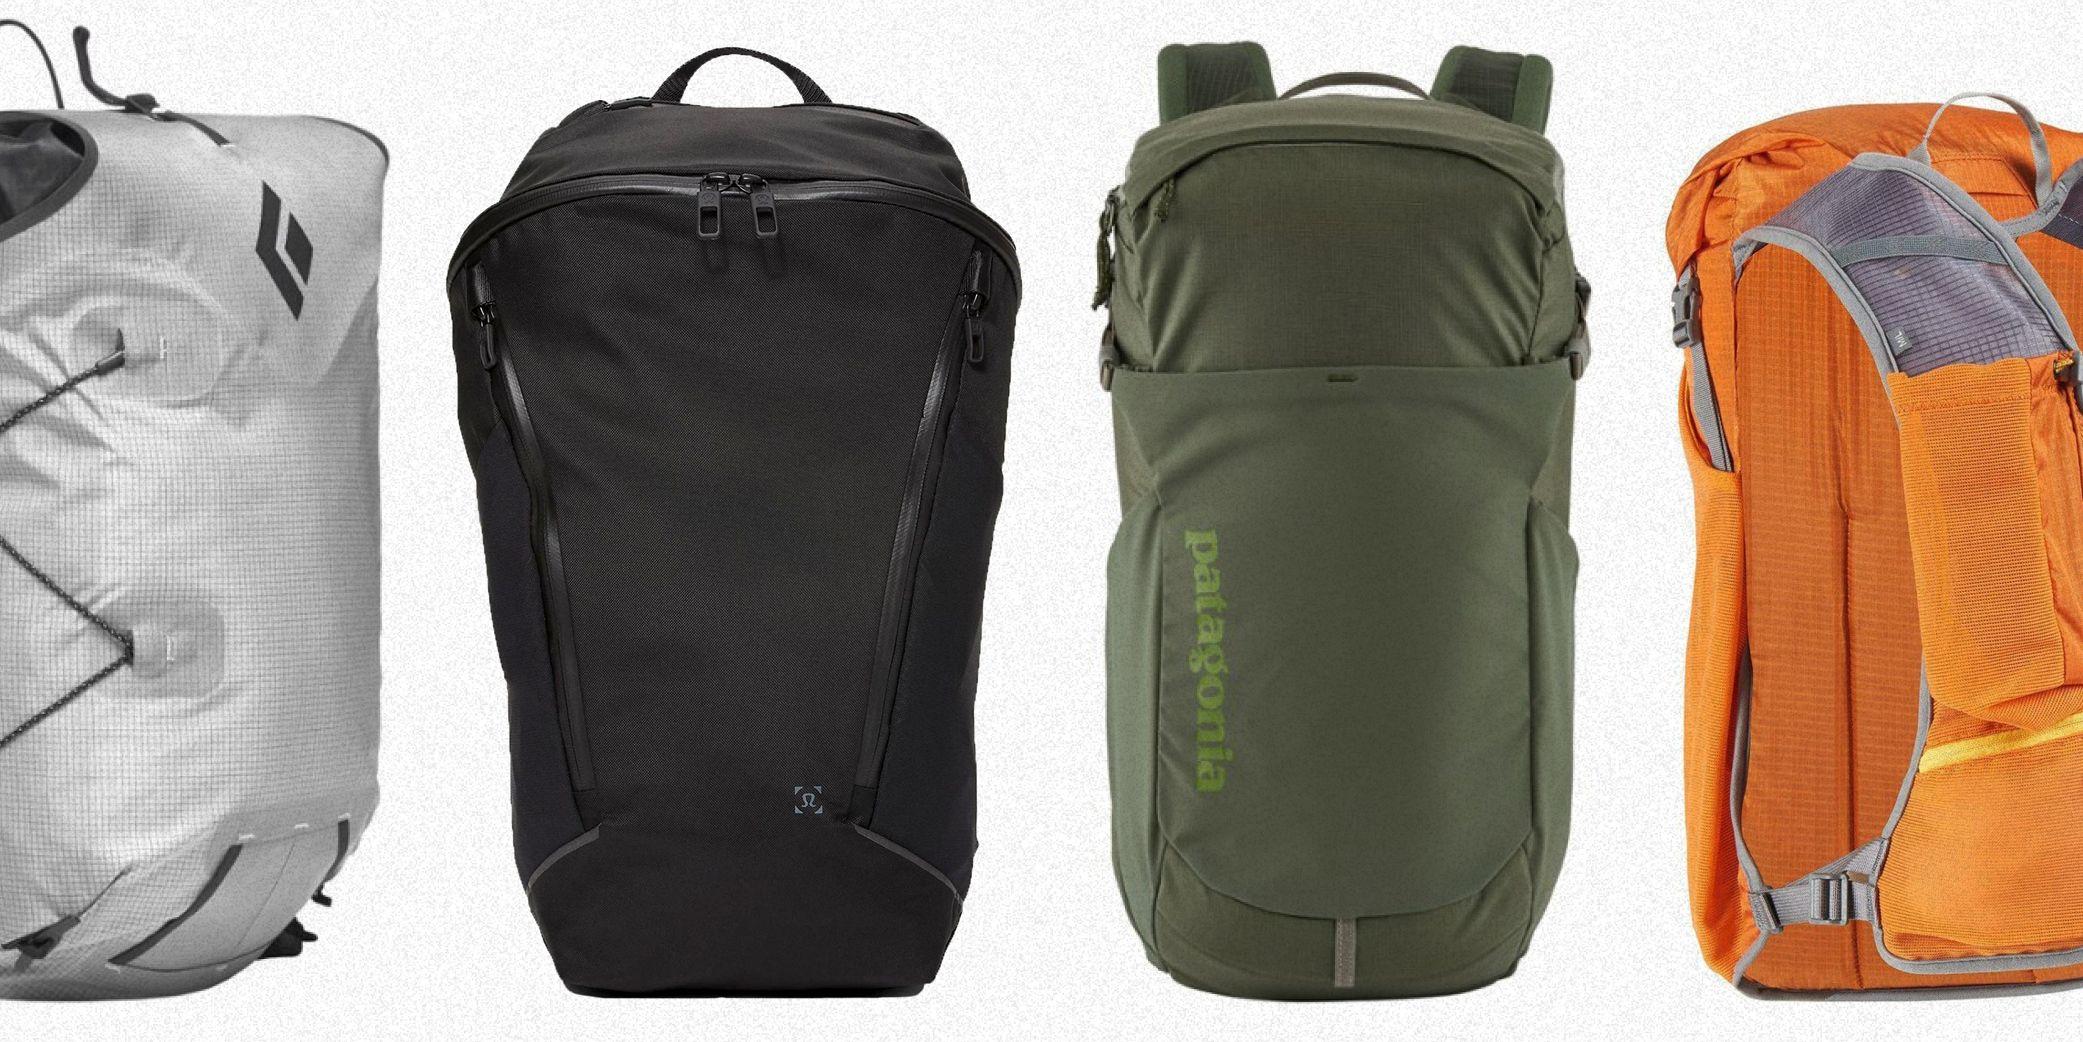 Lightweight Waterproof Large Storage Drawstring Bag For Men /& Women Moon Phases Cinch Backpack Sackpack Tote Sack